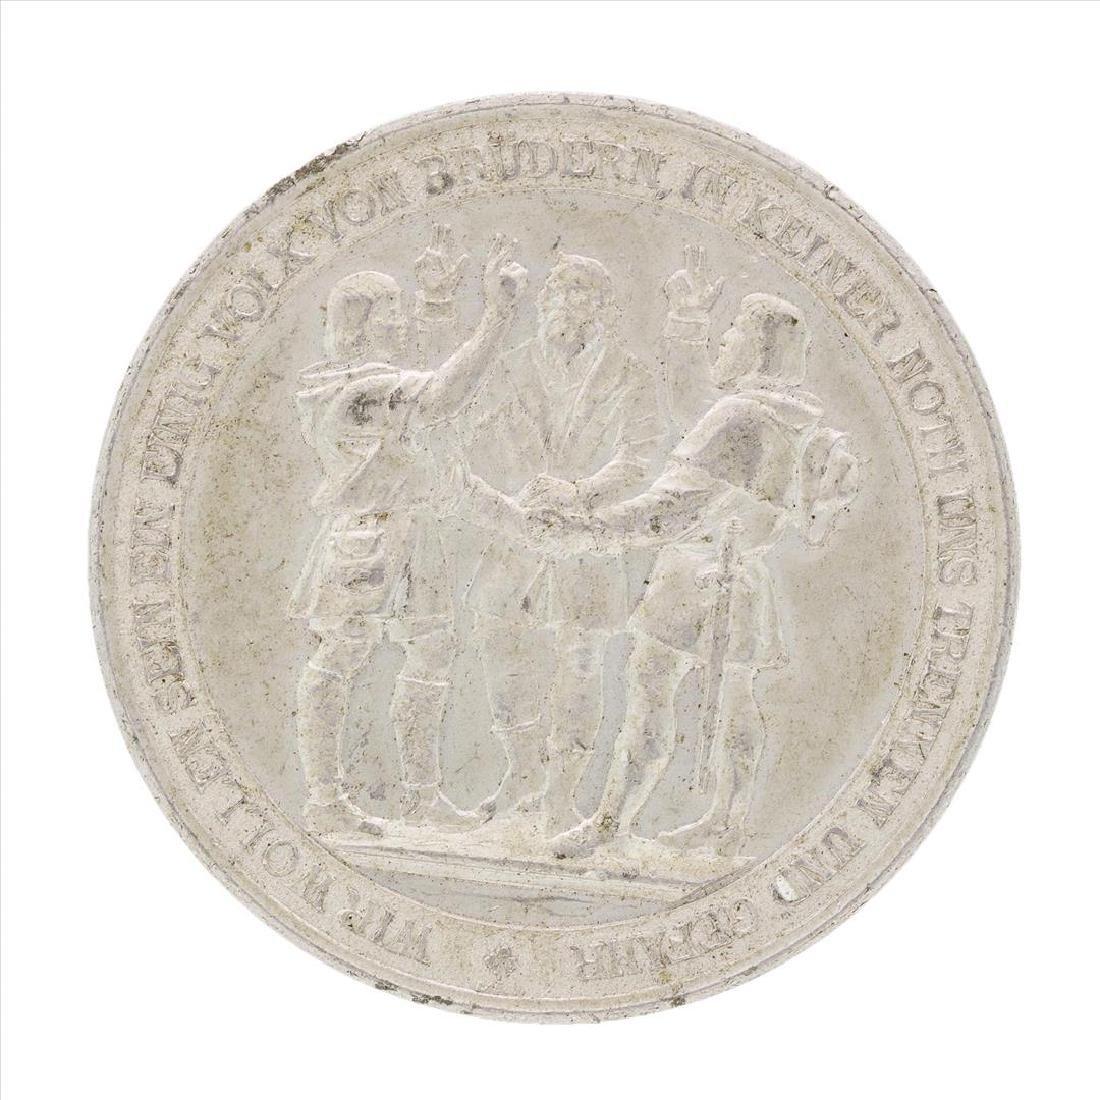 1891 Switzerland Medal